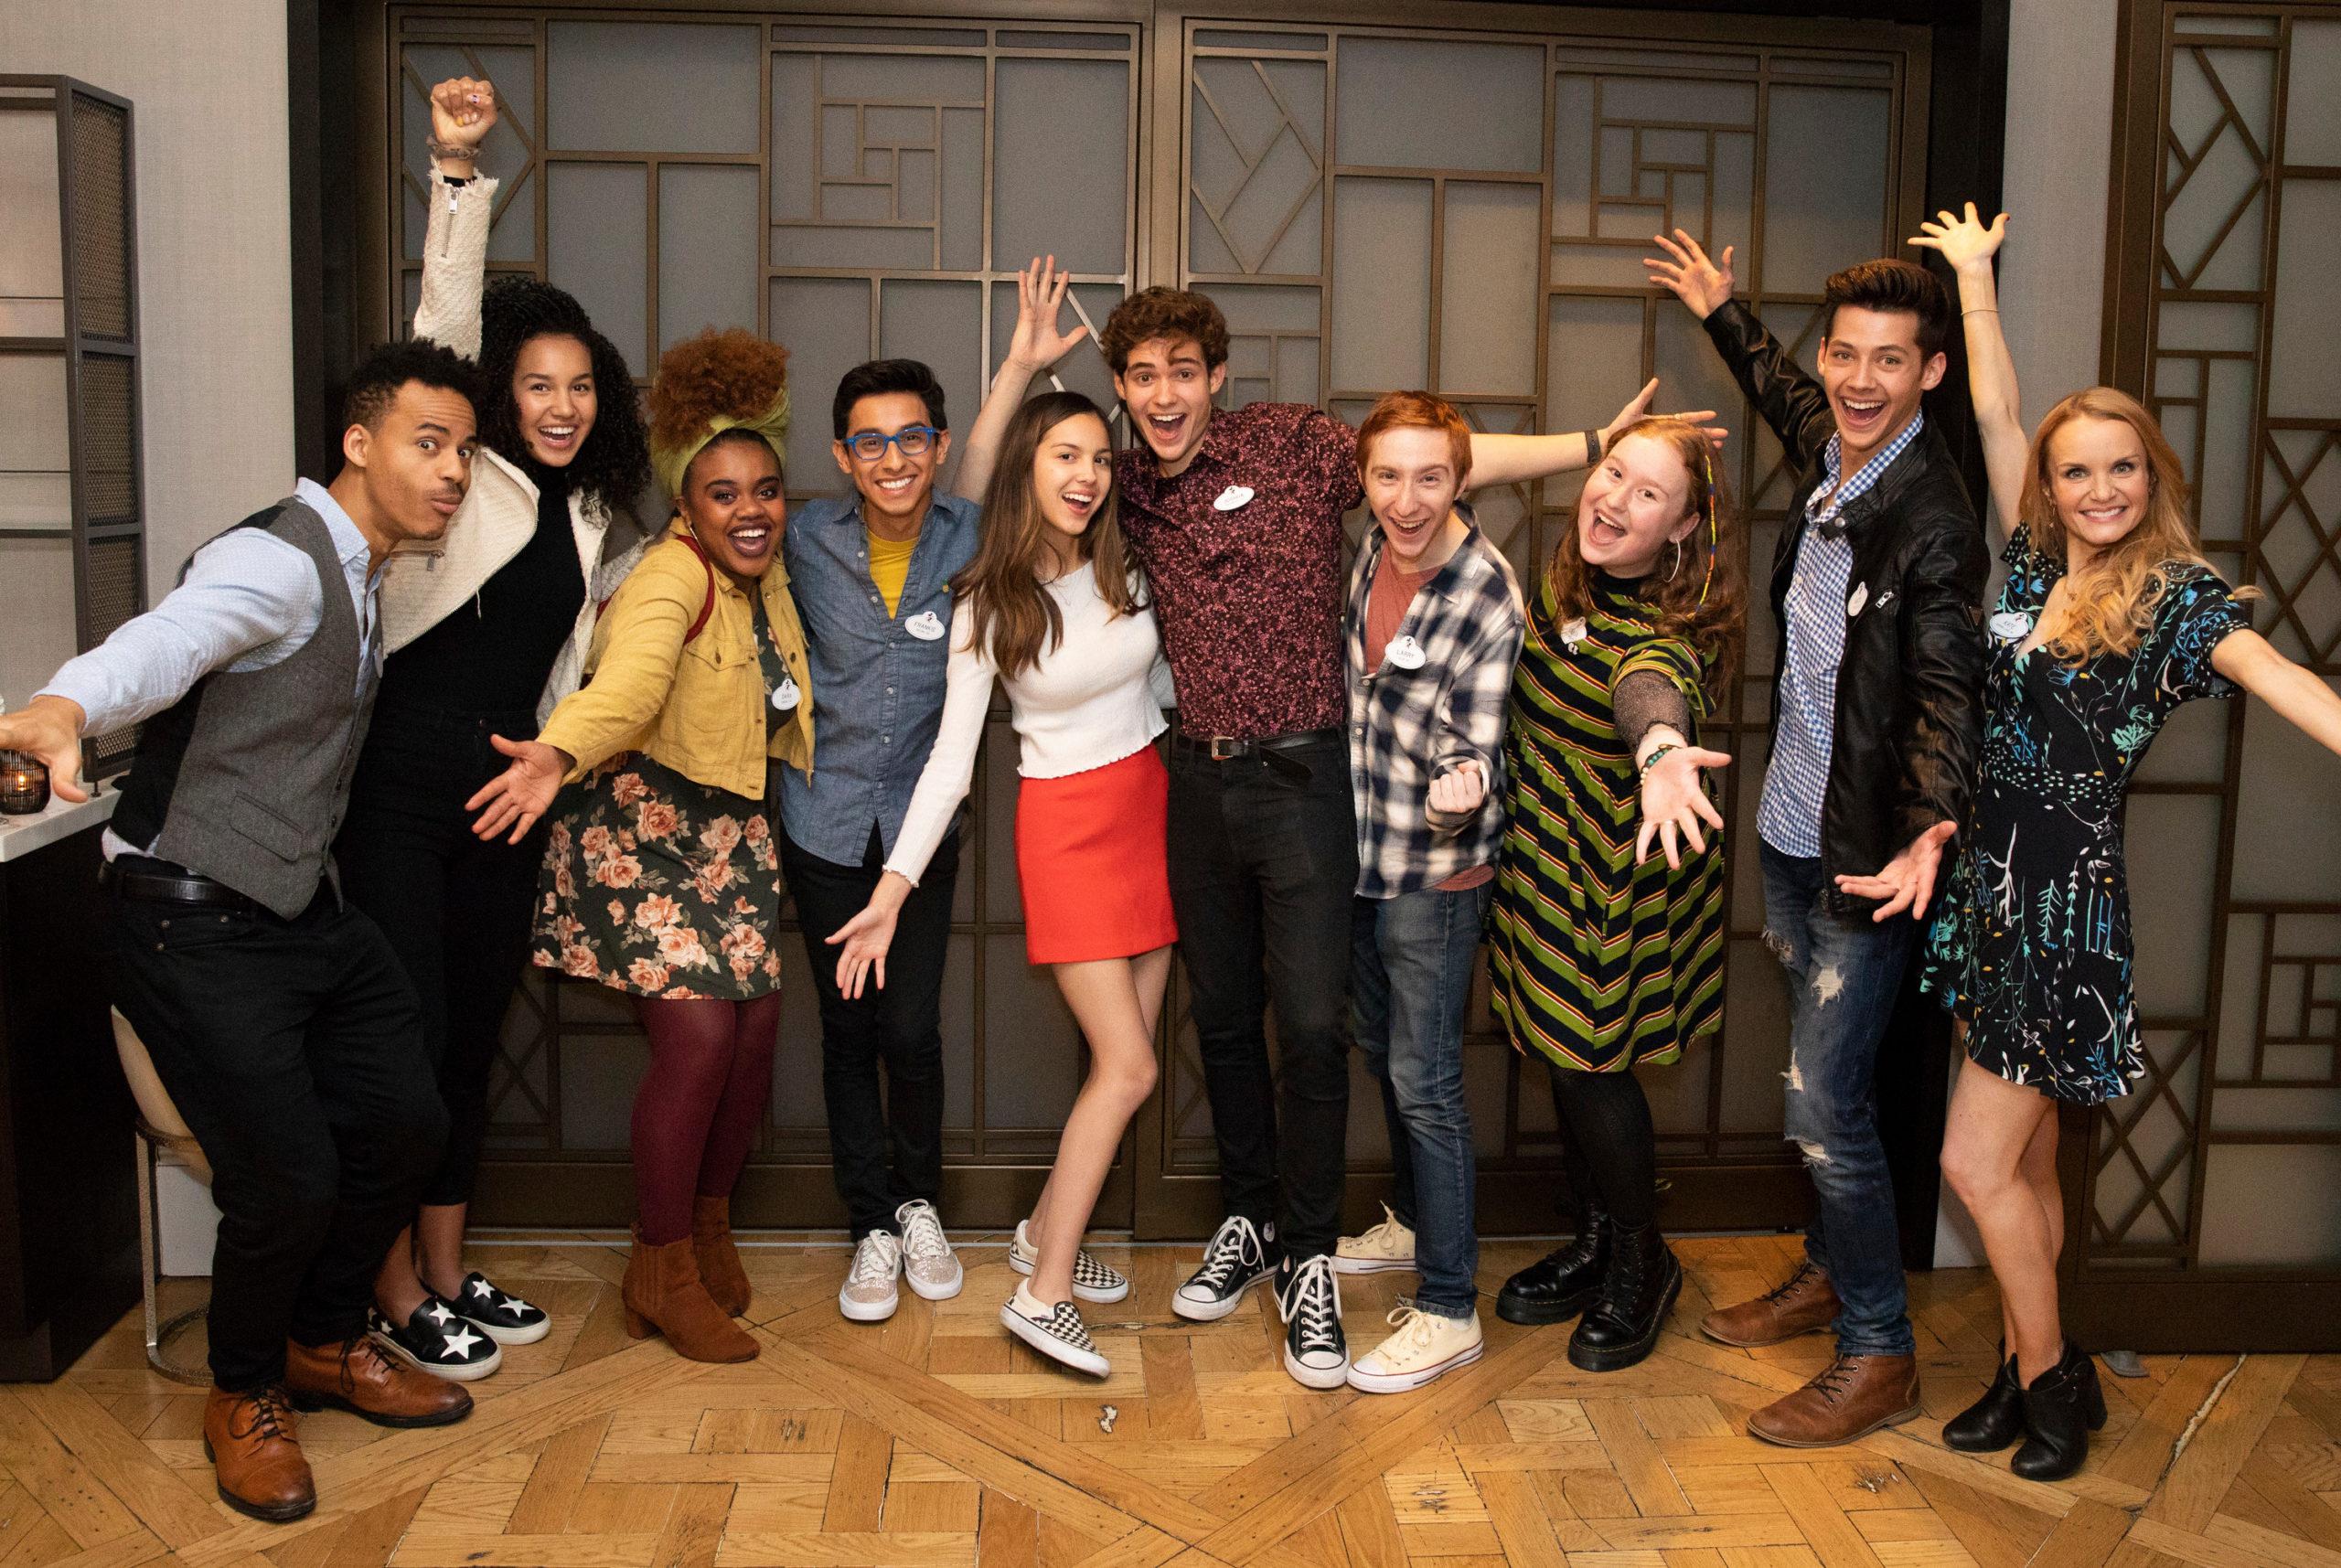 Kate Reinders unveils Secret Behind Her'High School Musical' Show